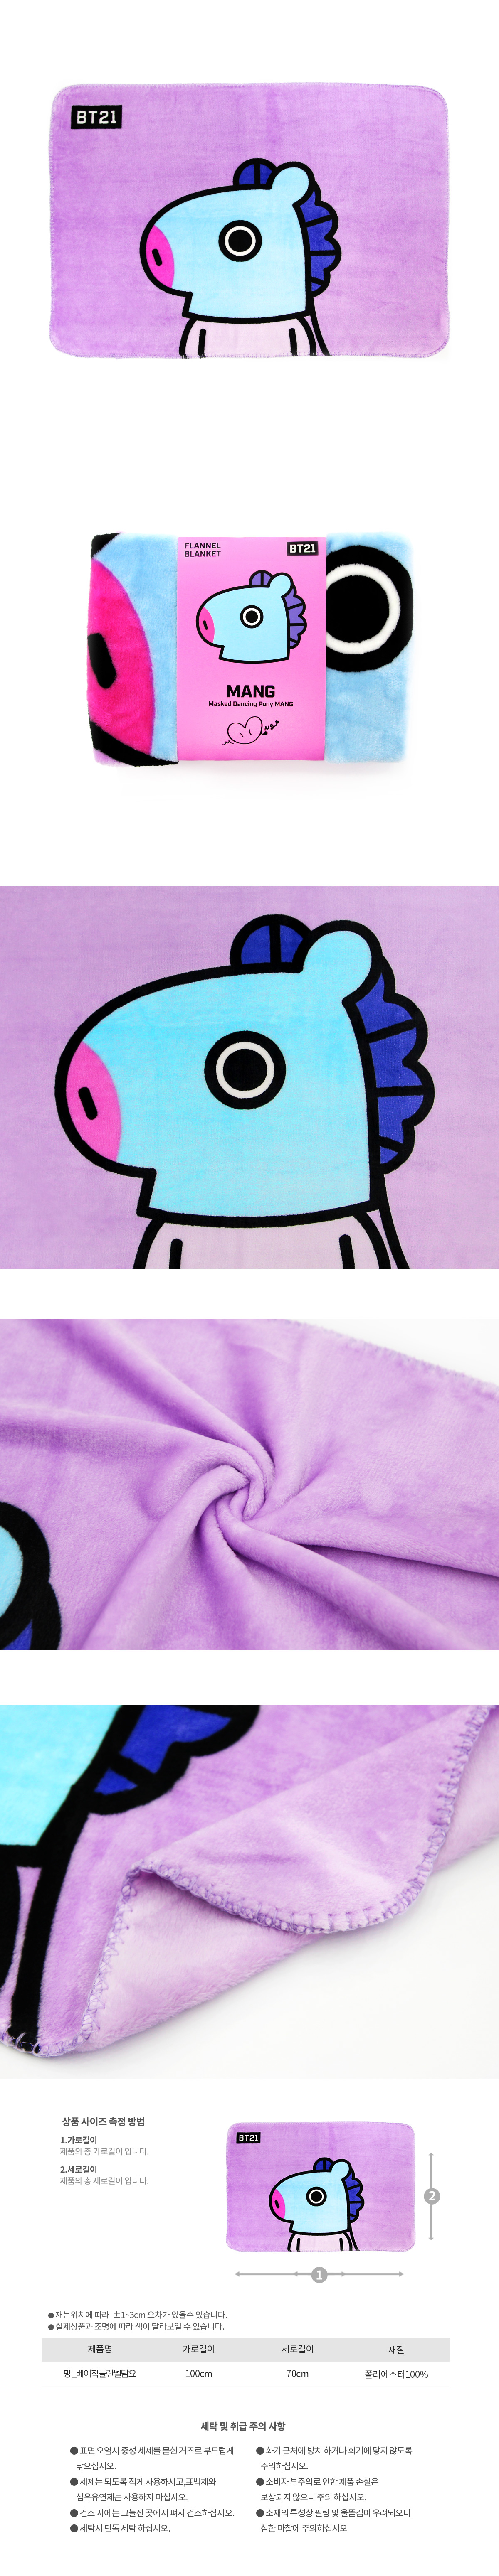 bt21xhp_blanket.jpg